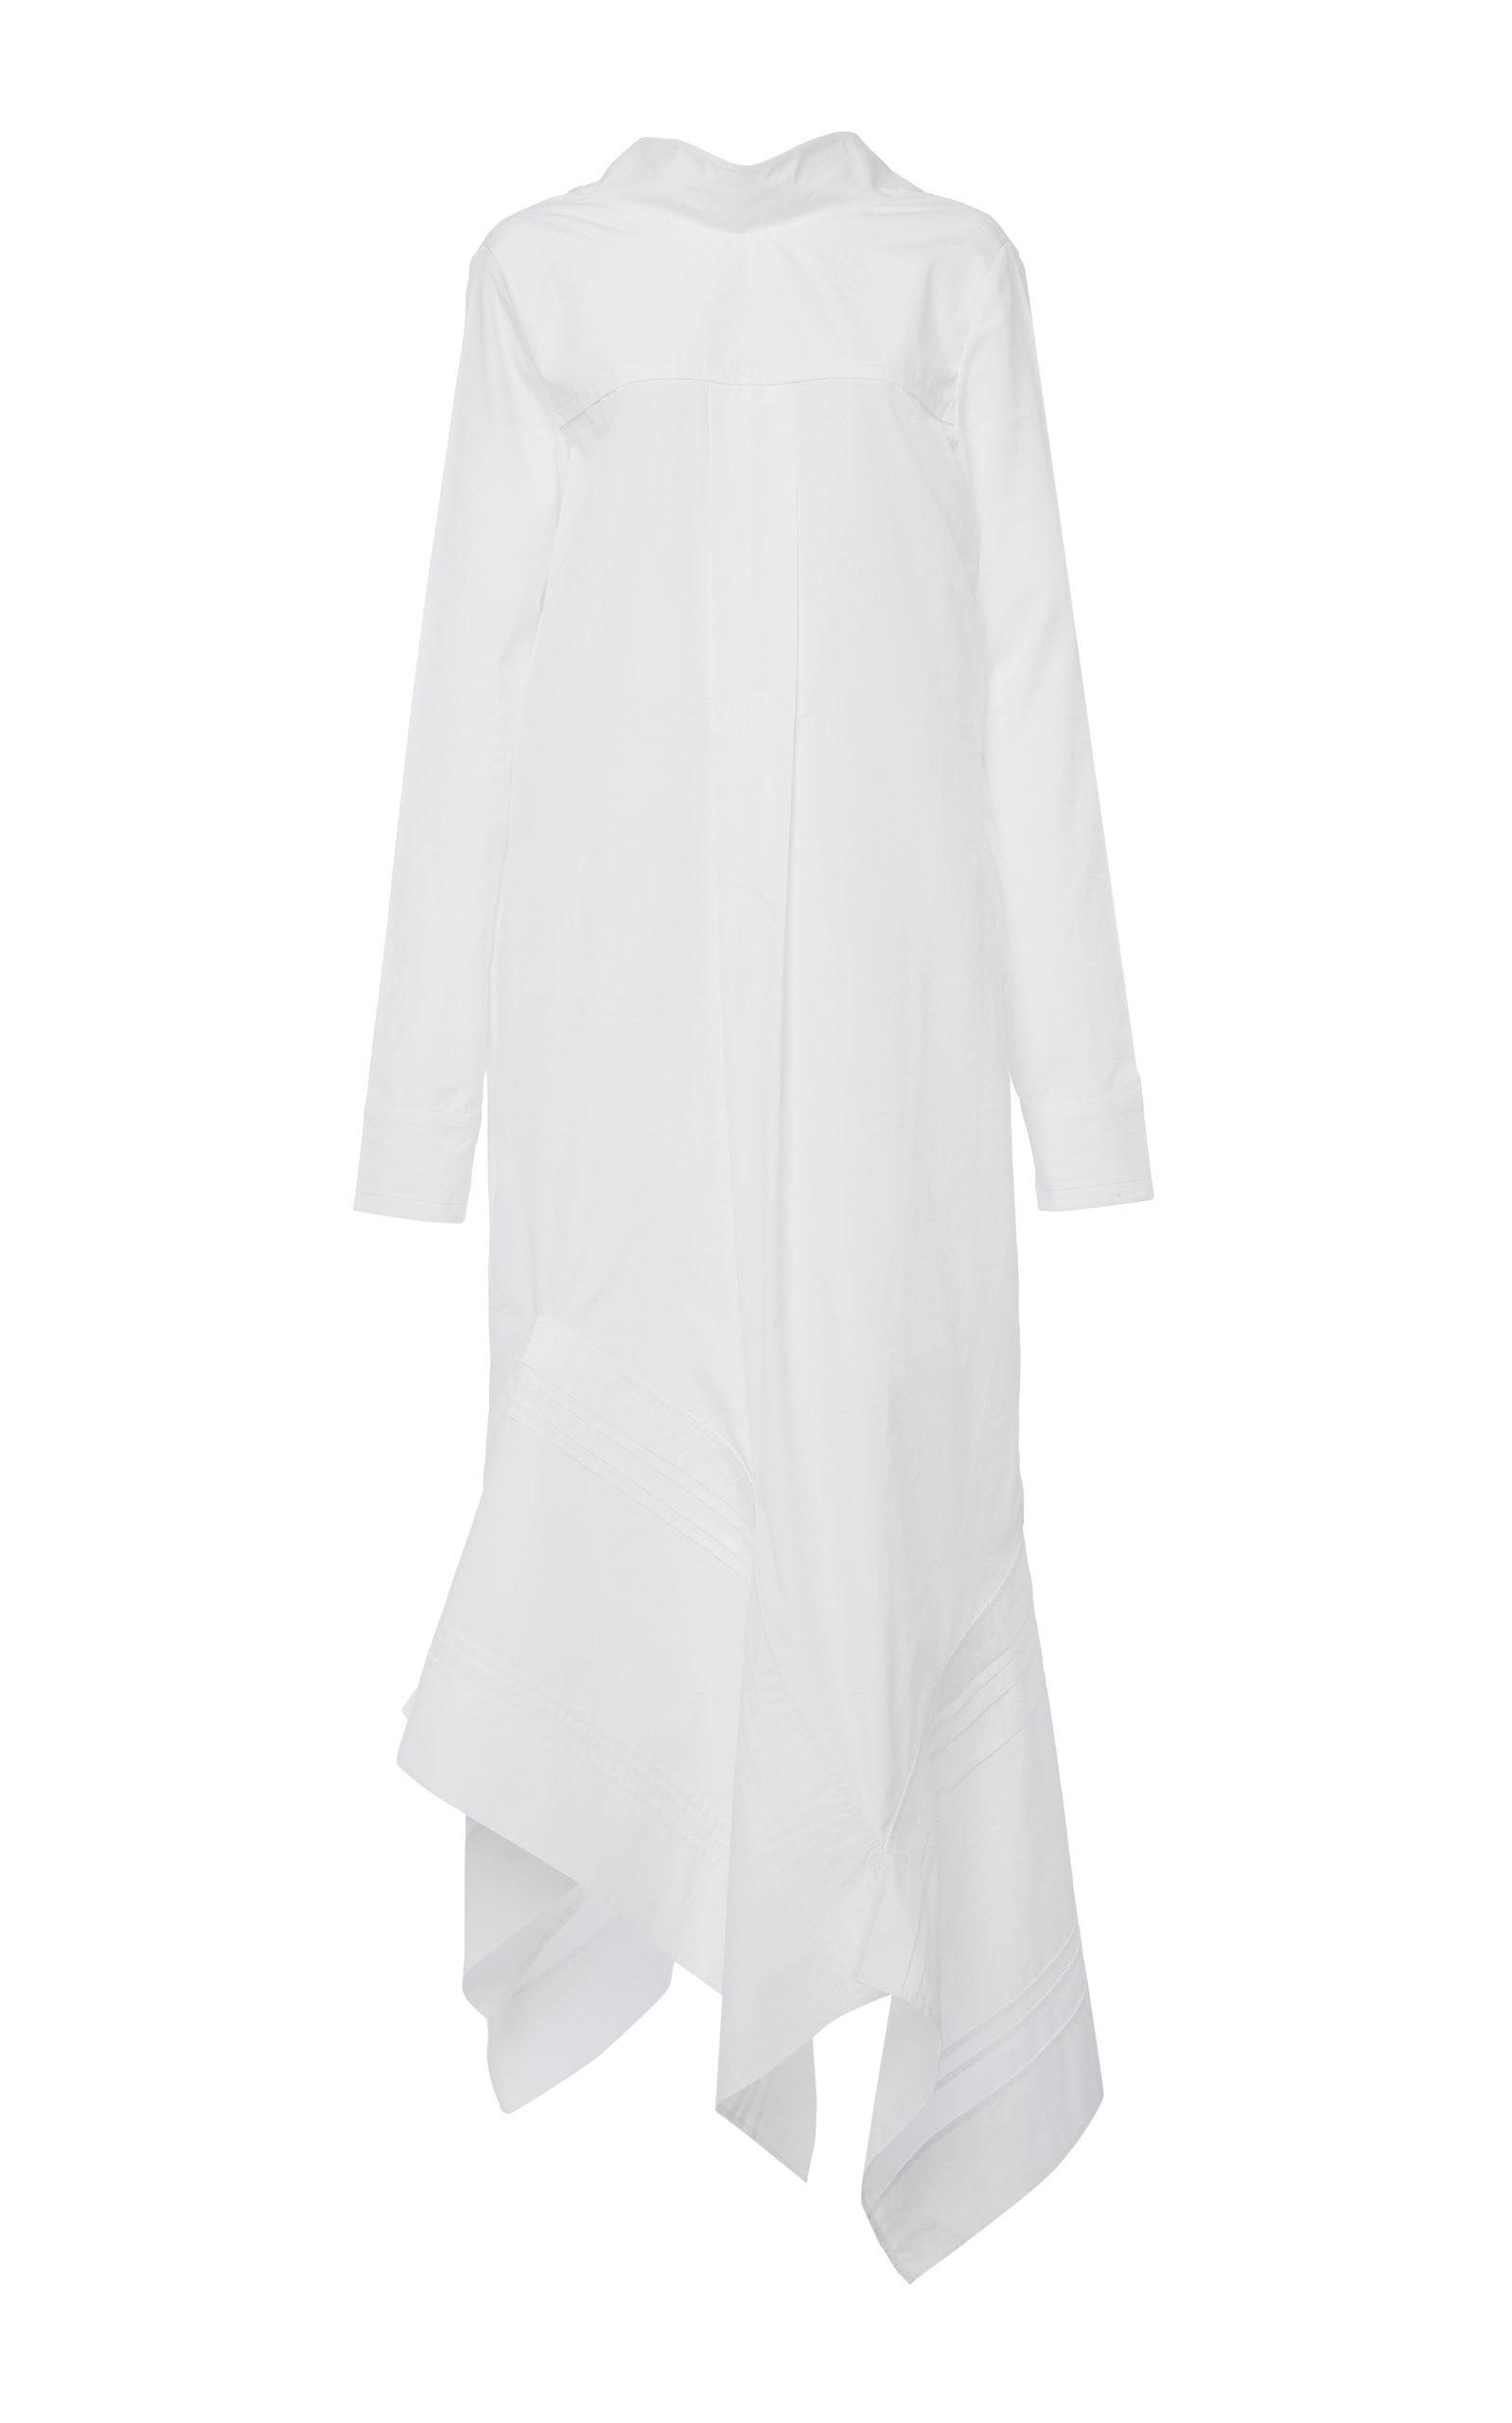 Buy Jil Sander Miranda Asymmetric Cotton Dress online, shop Jil Sander at the best price